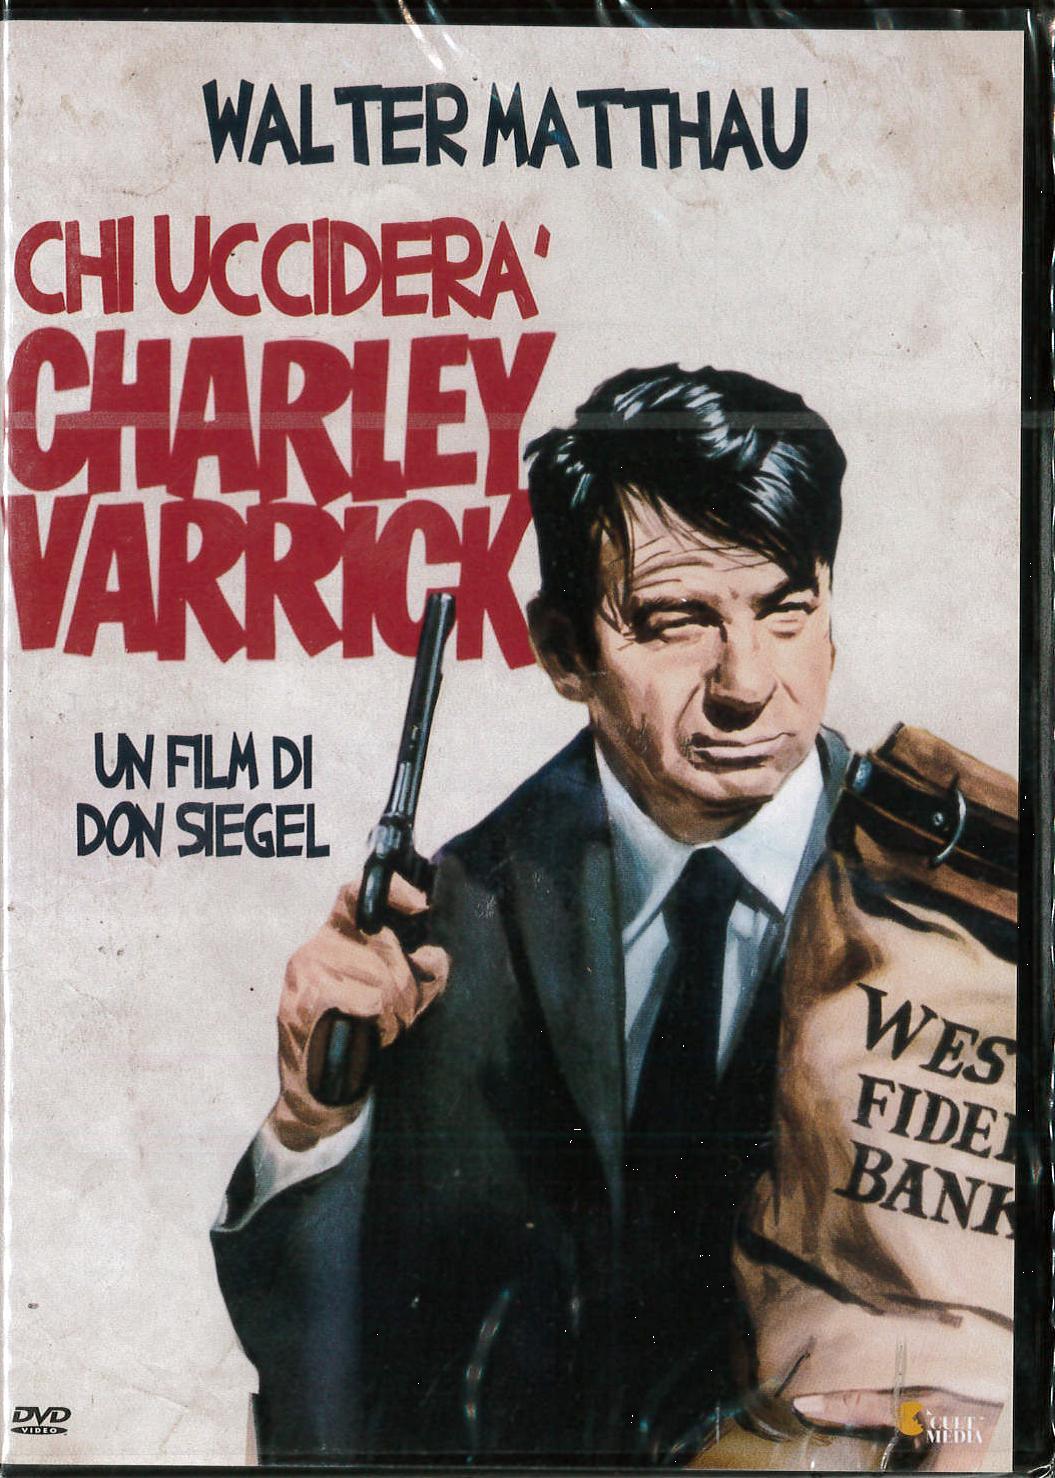 CHI UCCIDERA' CHARLEY VARRICK (DVD)